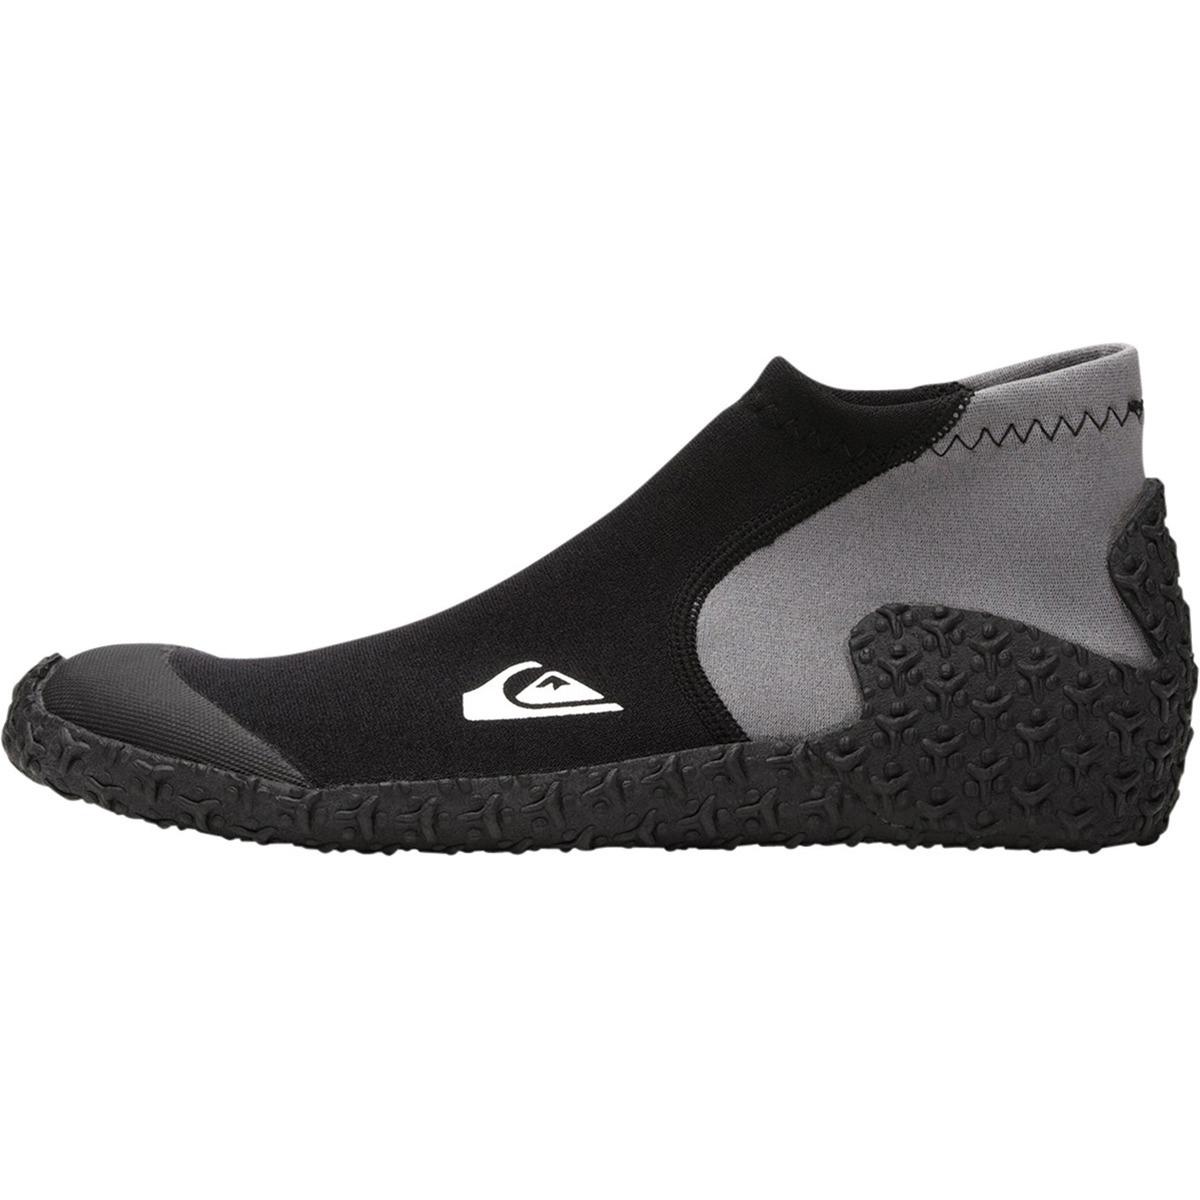 reef shoes quiksilver reef walker aqua shoes - mens icdmbas